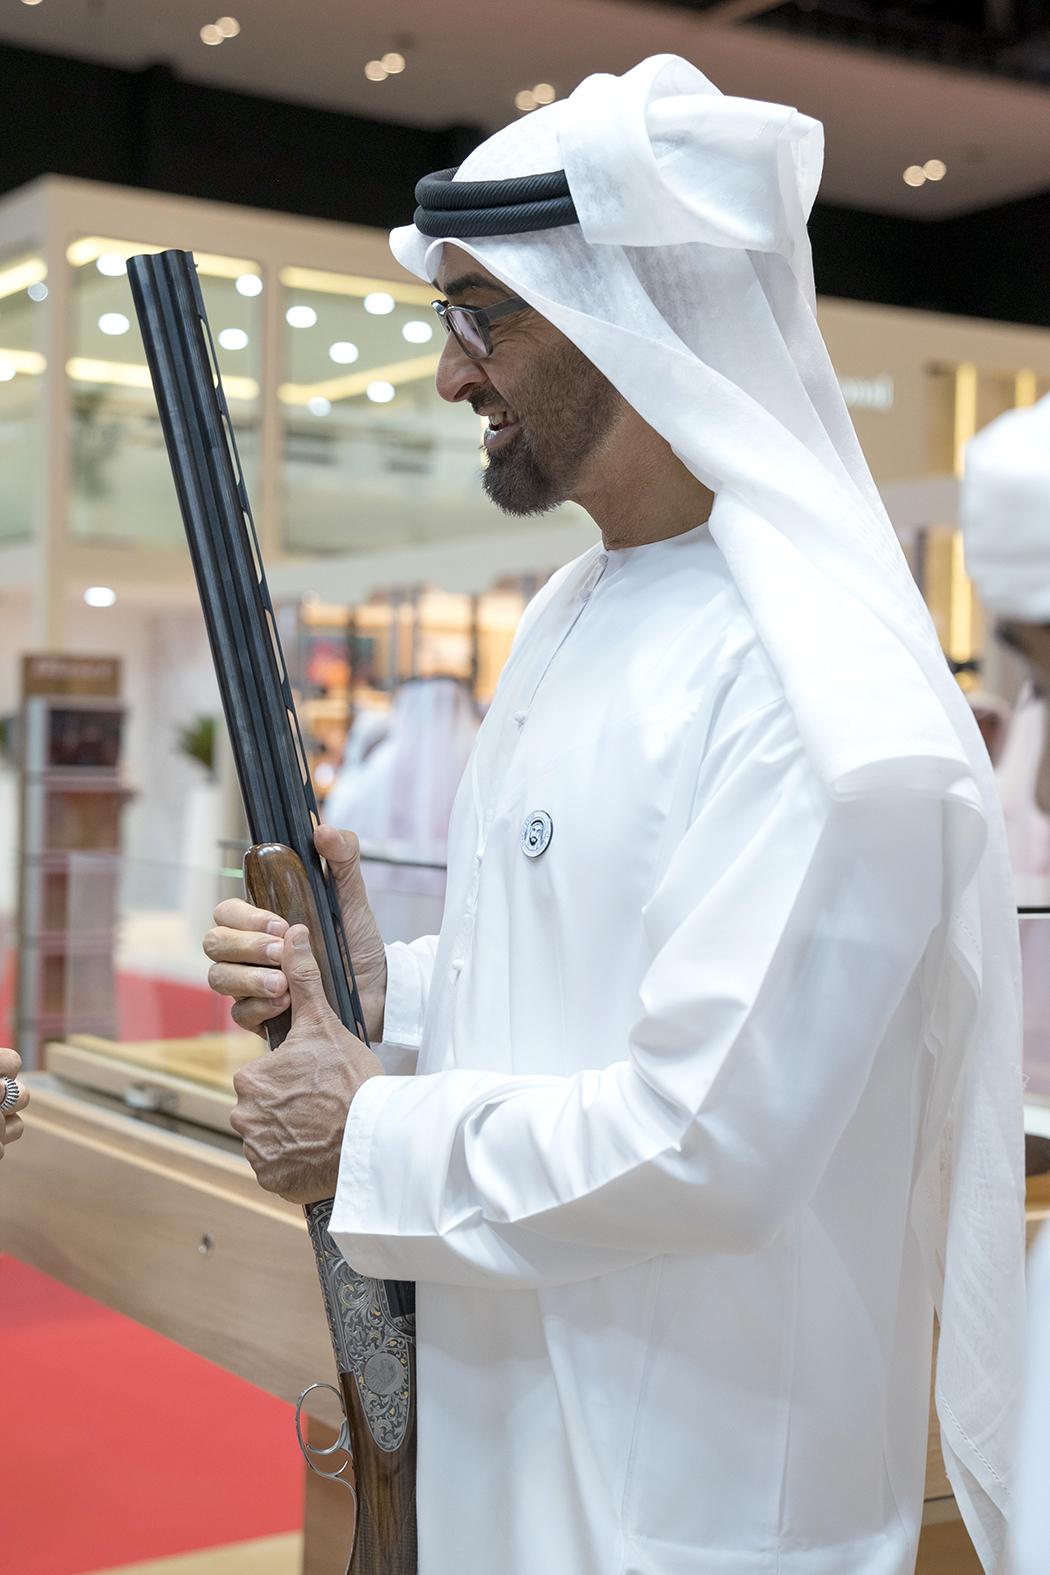 Visita de Sua Alteza Sheik Mohammed bin Zayed e Soberanos dos ... 2b2722ed63f32